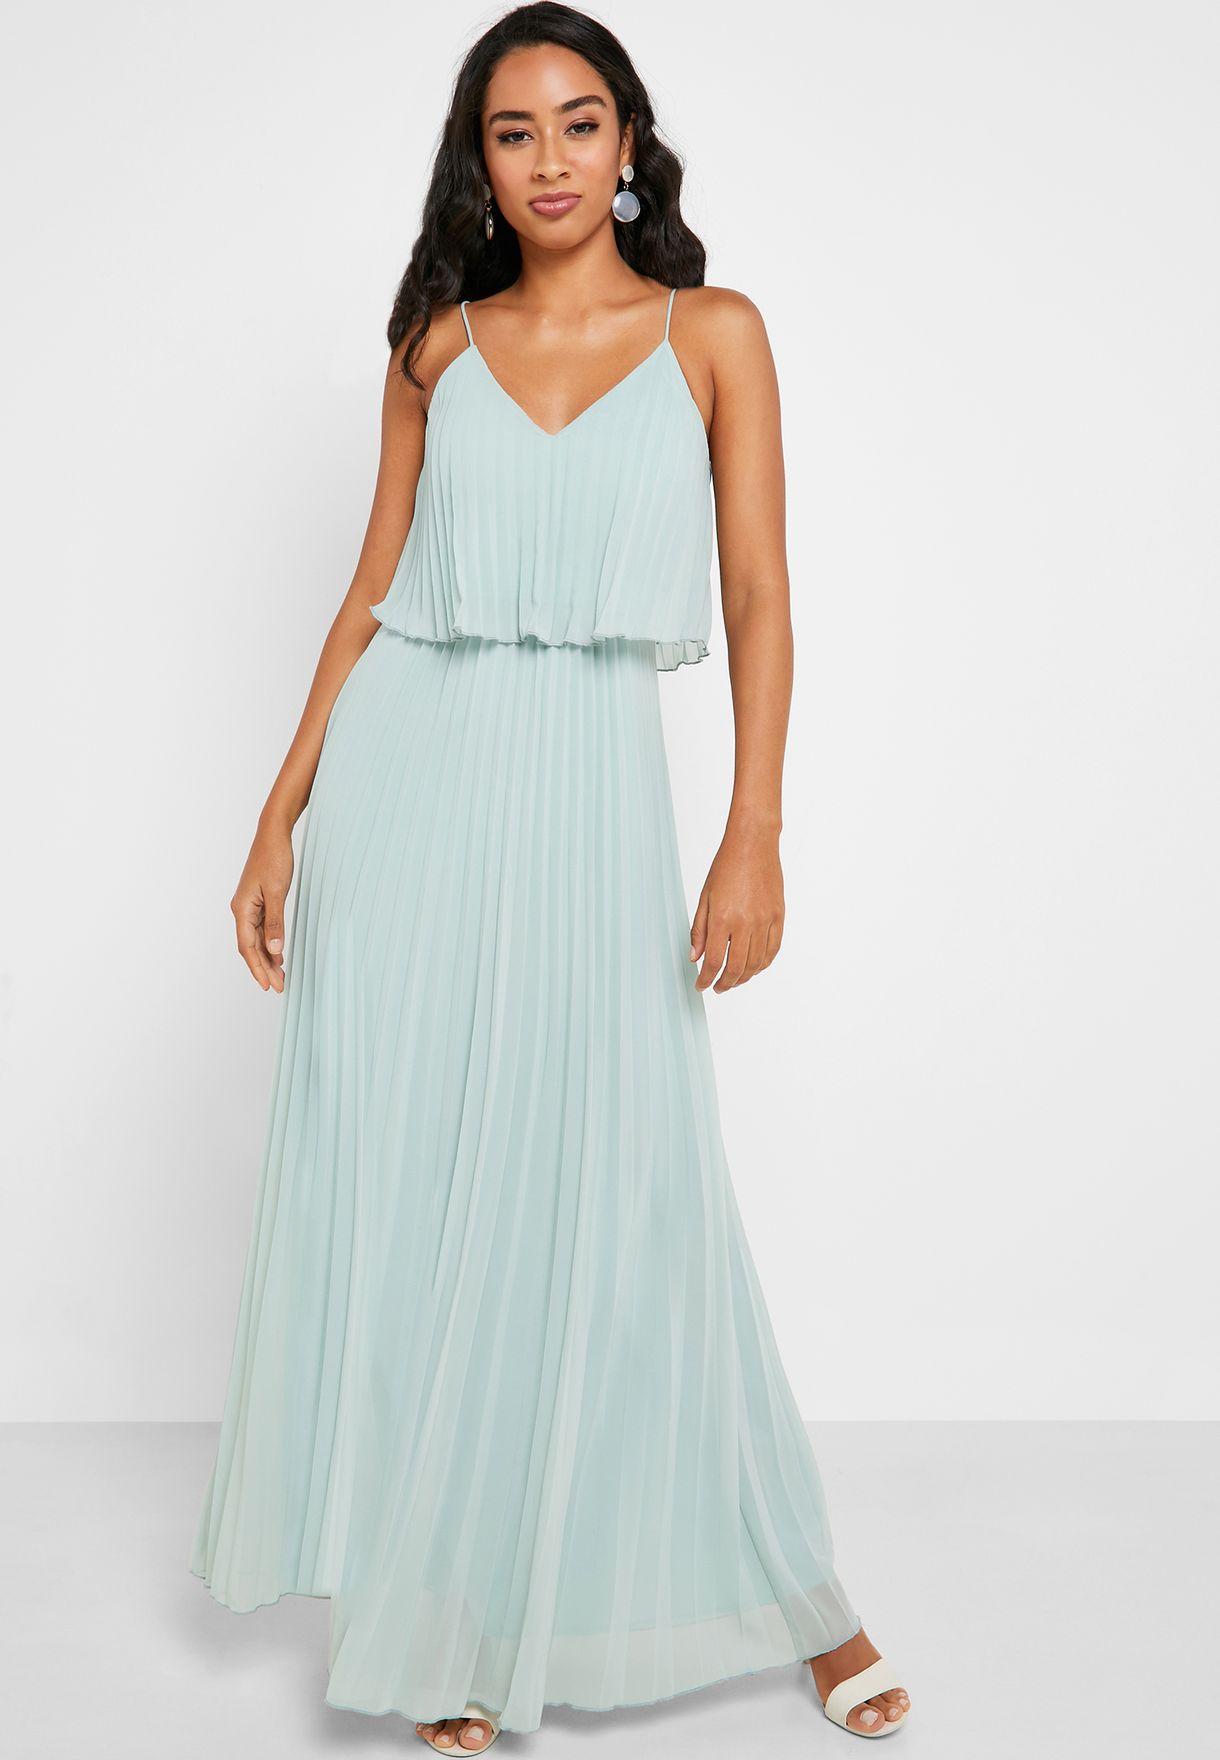 Layered Pleated Cami Dress